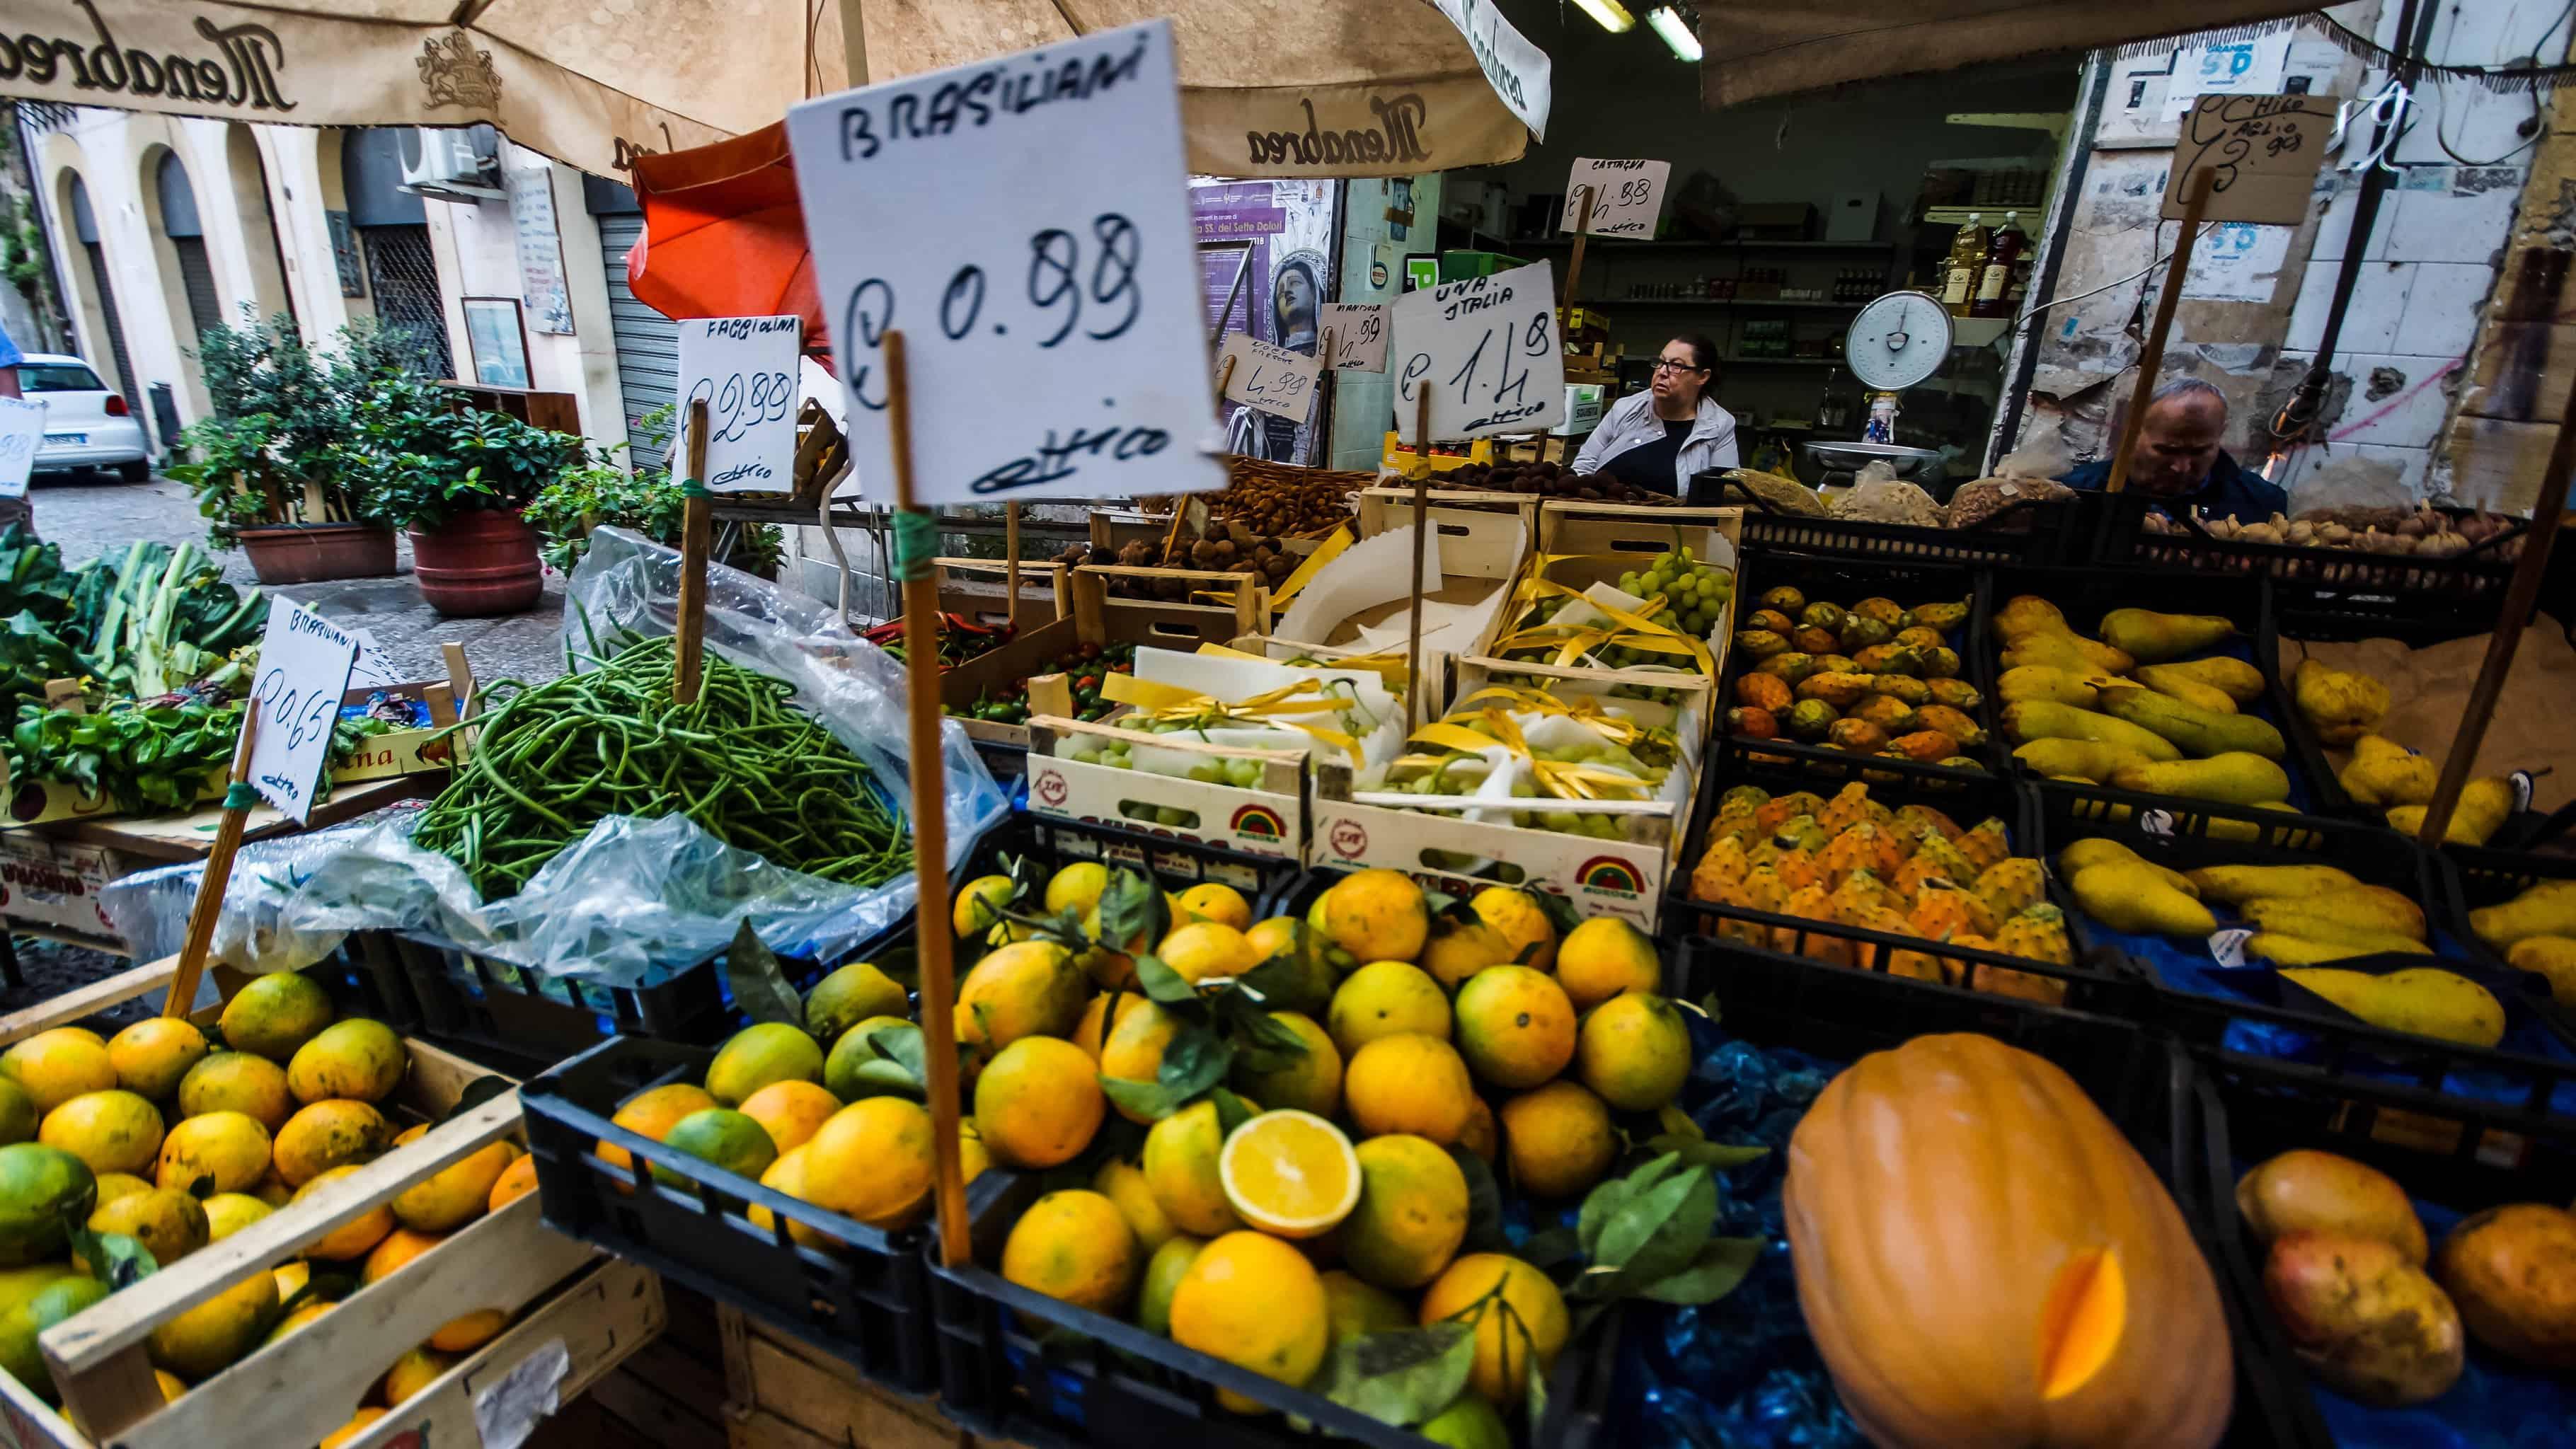 Day 4 – Palermo, Sicily | BeyondCruise